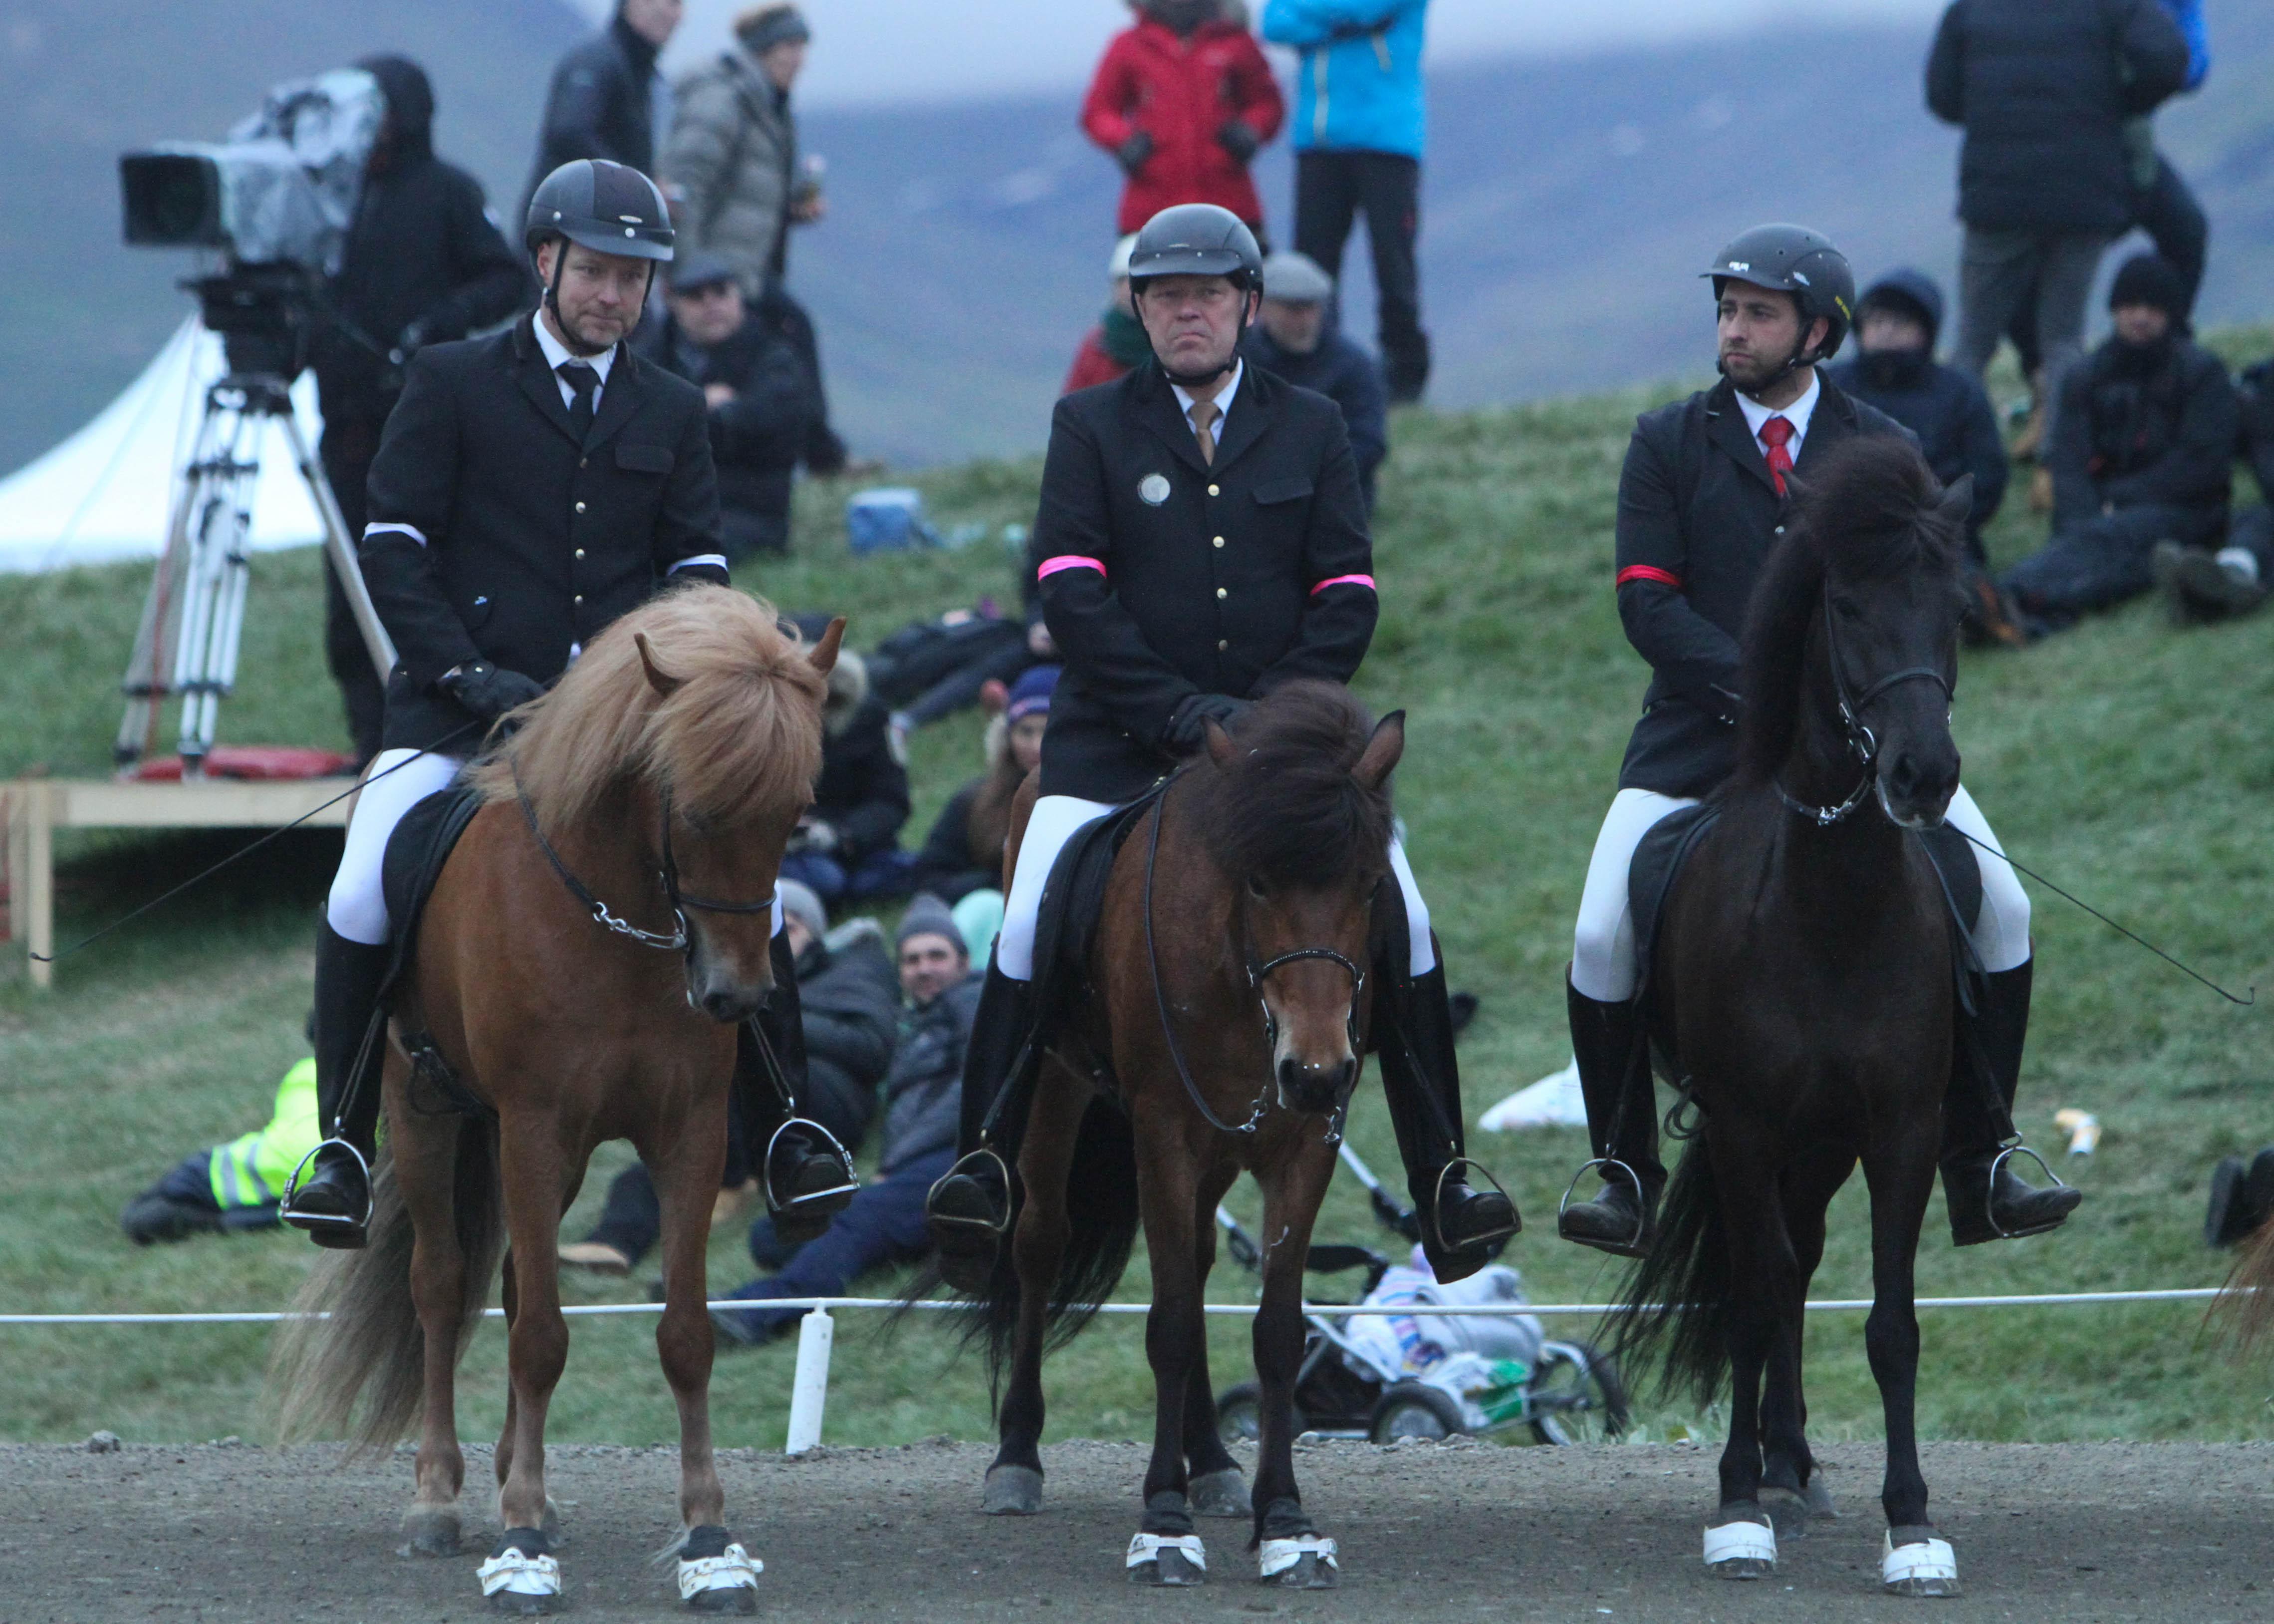 Ettan, tvåan och trean Foto: Karin Cederman/ishestnews.se